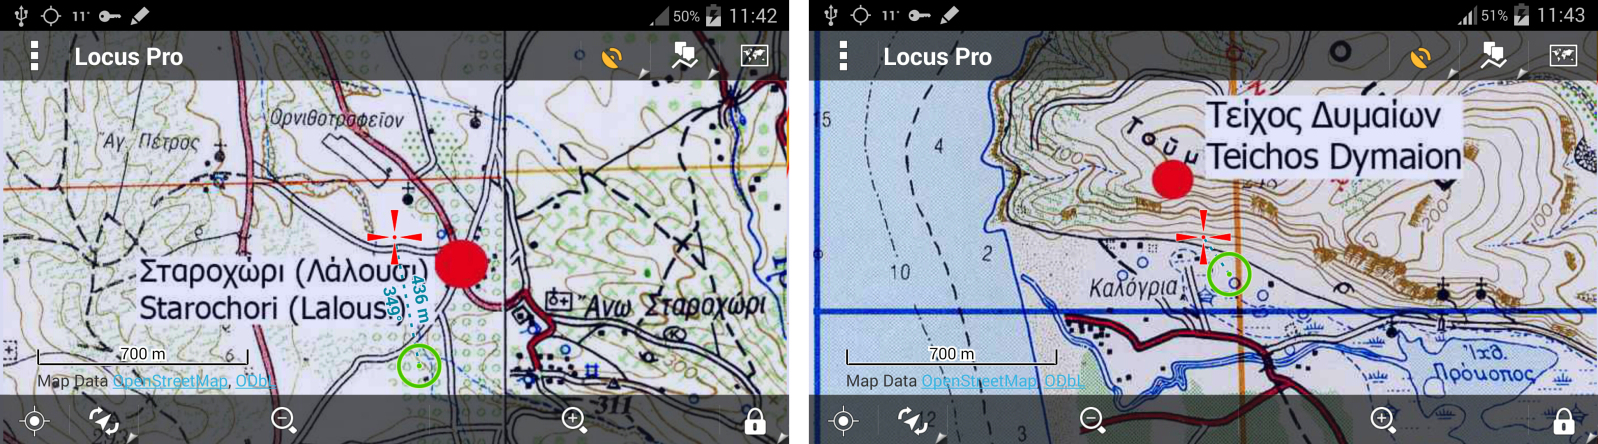 Locus Maps Πλοήγηση με χάρτες επικάλυψης! - Σελίδα 2 4l0cvs